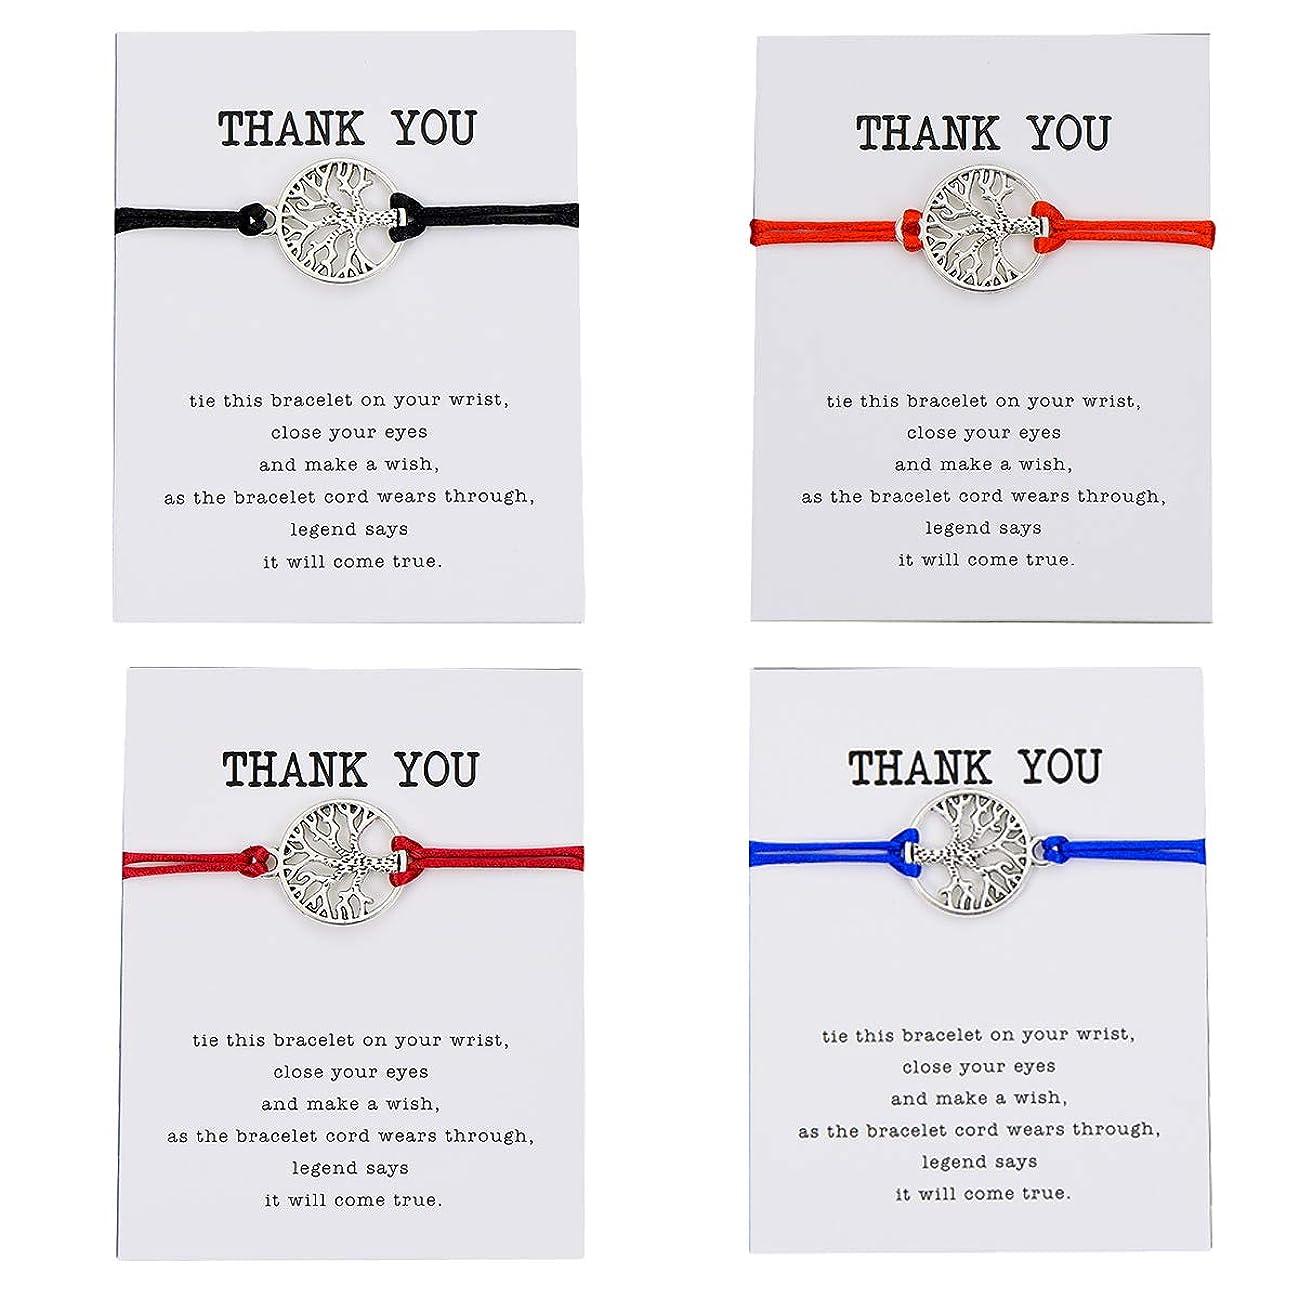 Pipitree Friendship Bracelet Gift Card -Thank You Wish Bracelet Jewelry Charm Bracelet for Friends(4Pcs)